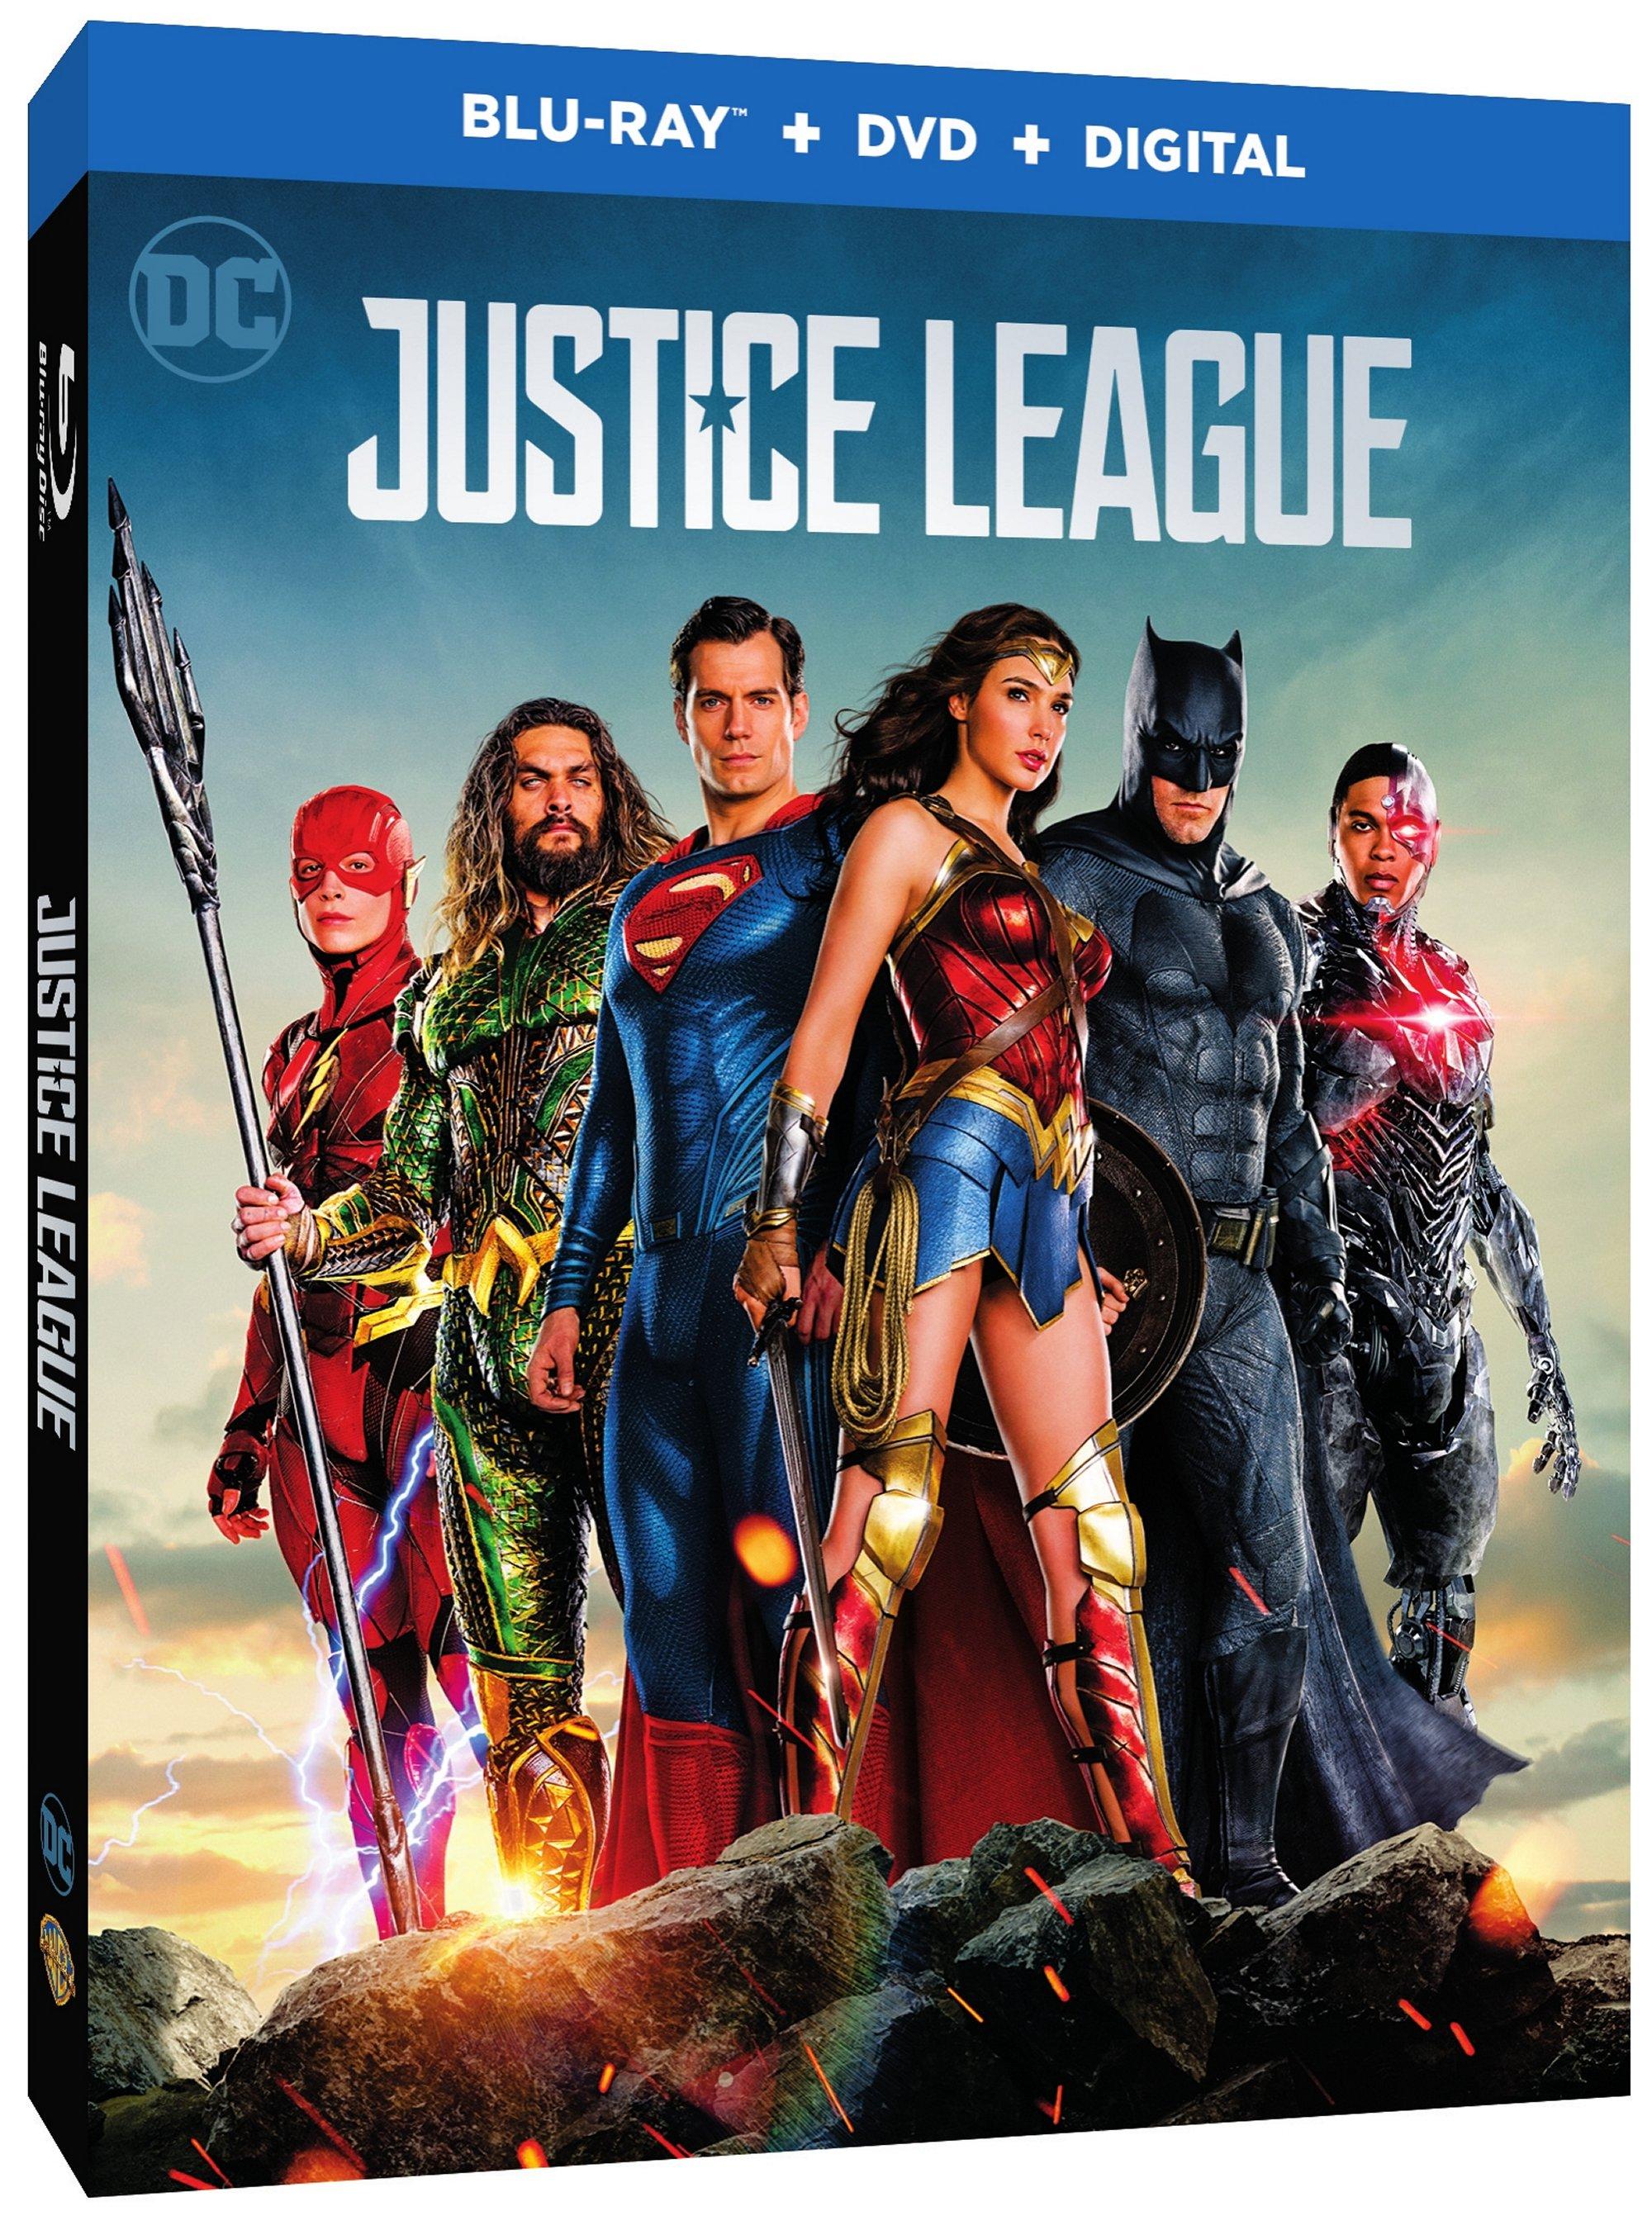 Justice League Digital & 4K, Blu-ray, DVD Release Dates Announced